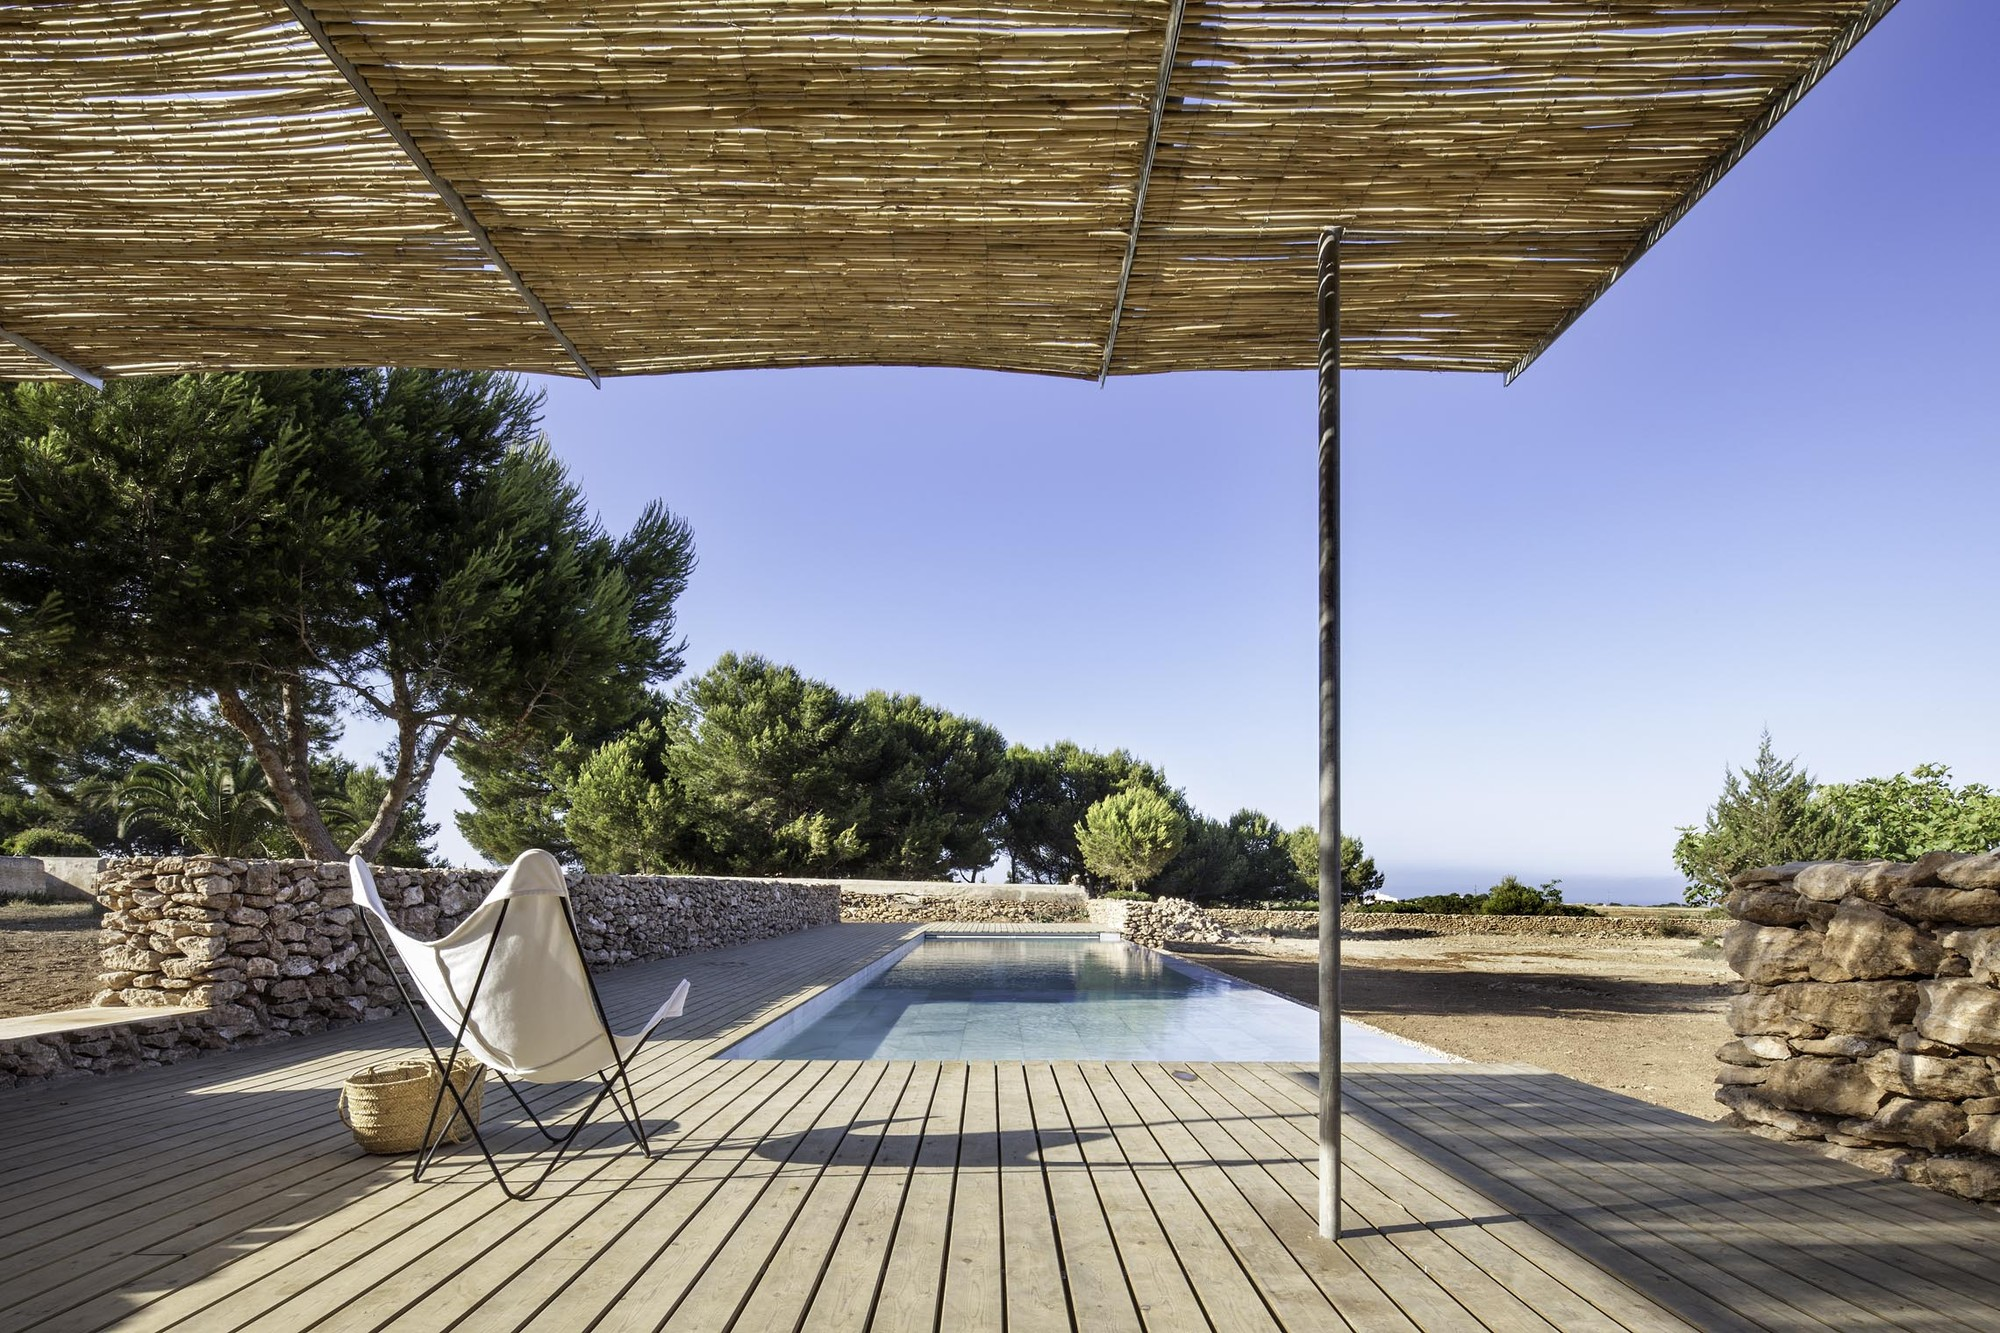 Arquitectura y Paisaje: Piscina en Formentera por Marià Castelló Martínez   , © Estudi Es Pujol de s'Era